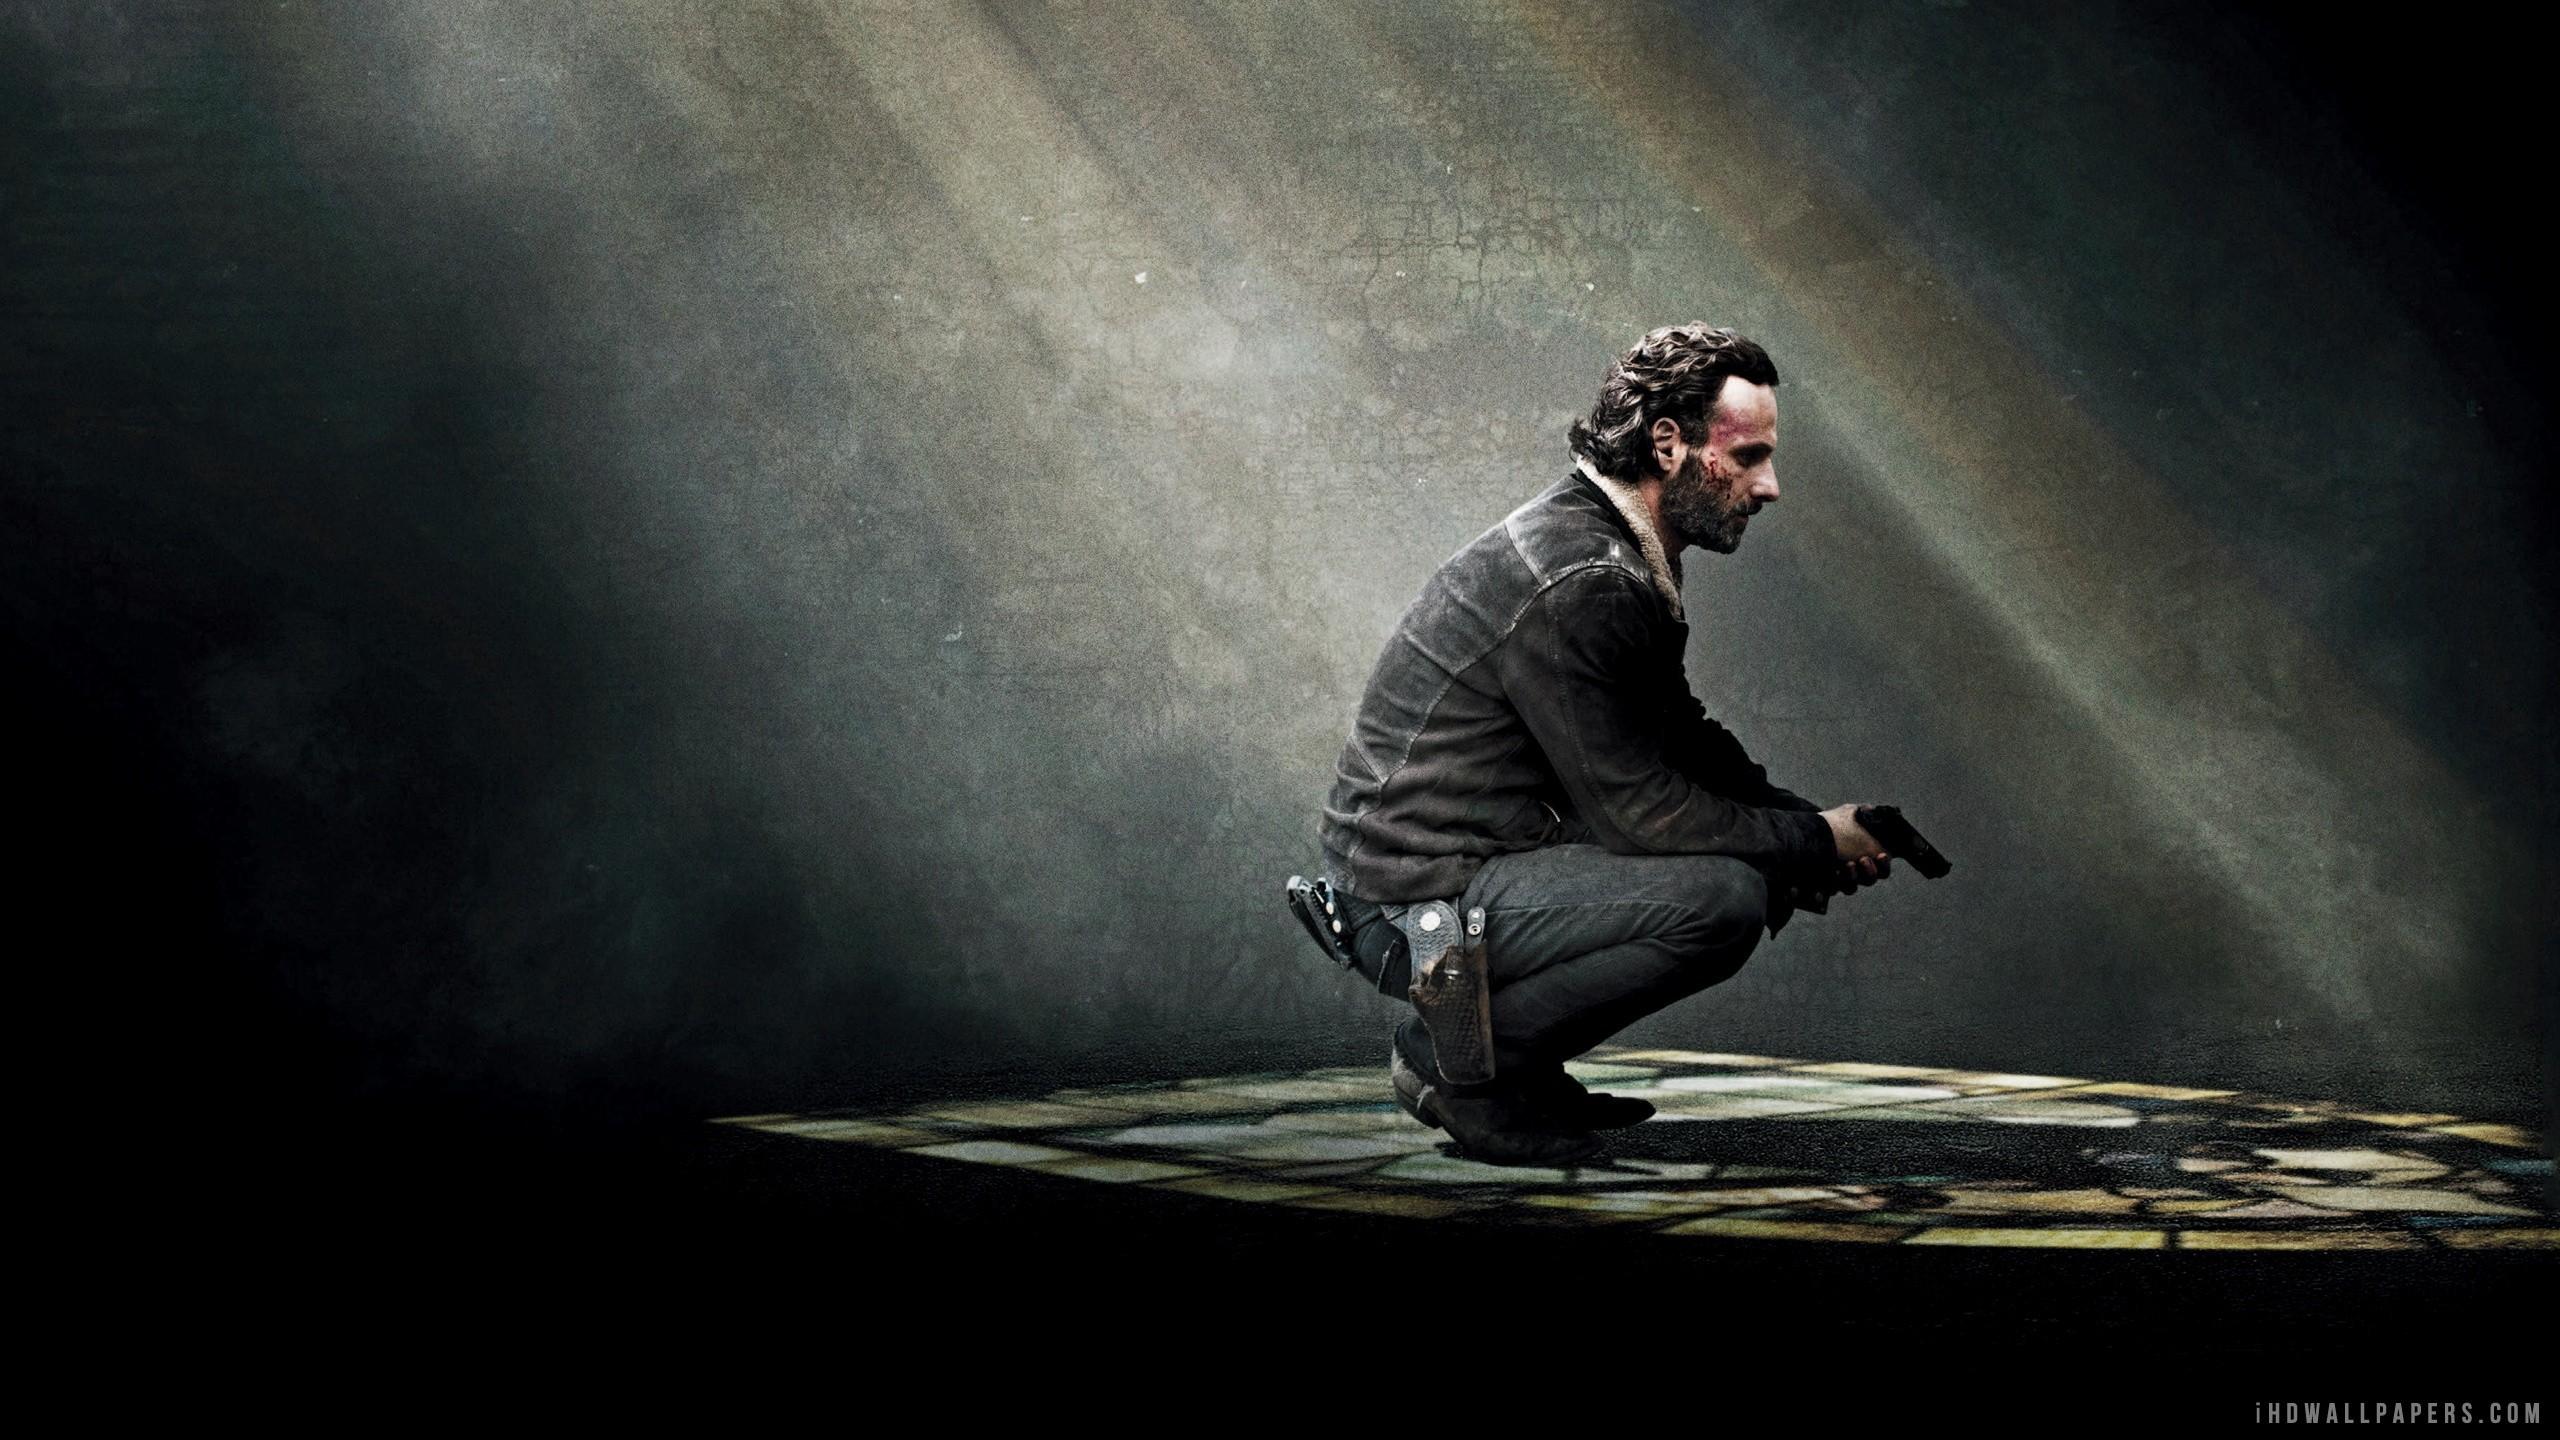 The Walking Dead Wallpapers: The Walking Dead Wallpaper ·① Download Free Stunning